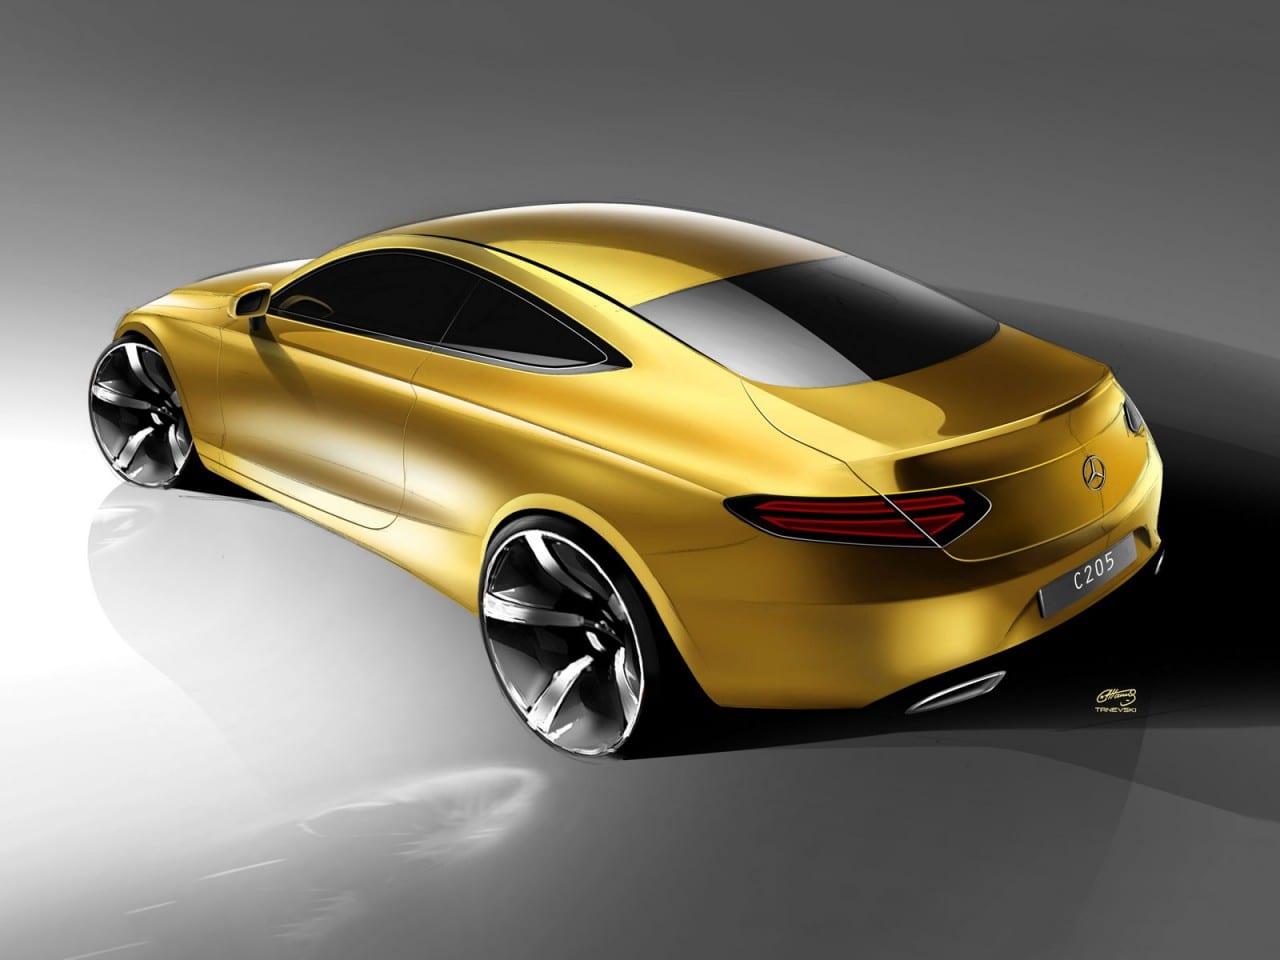 Mercedes-Benz C-Class Coupé Design Gallery